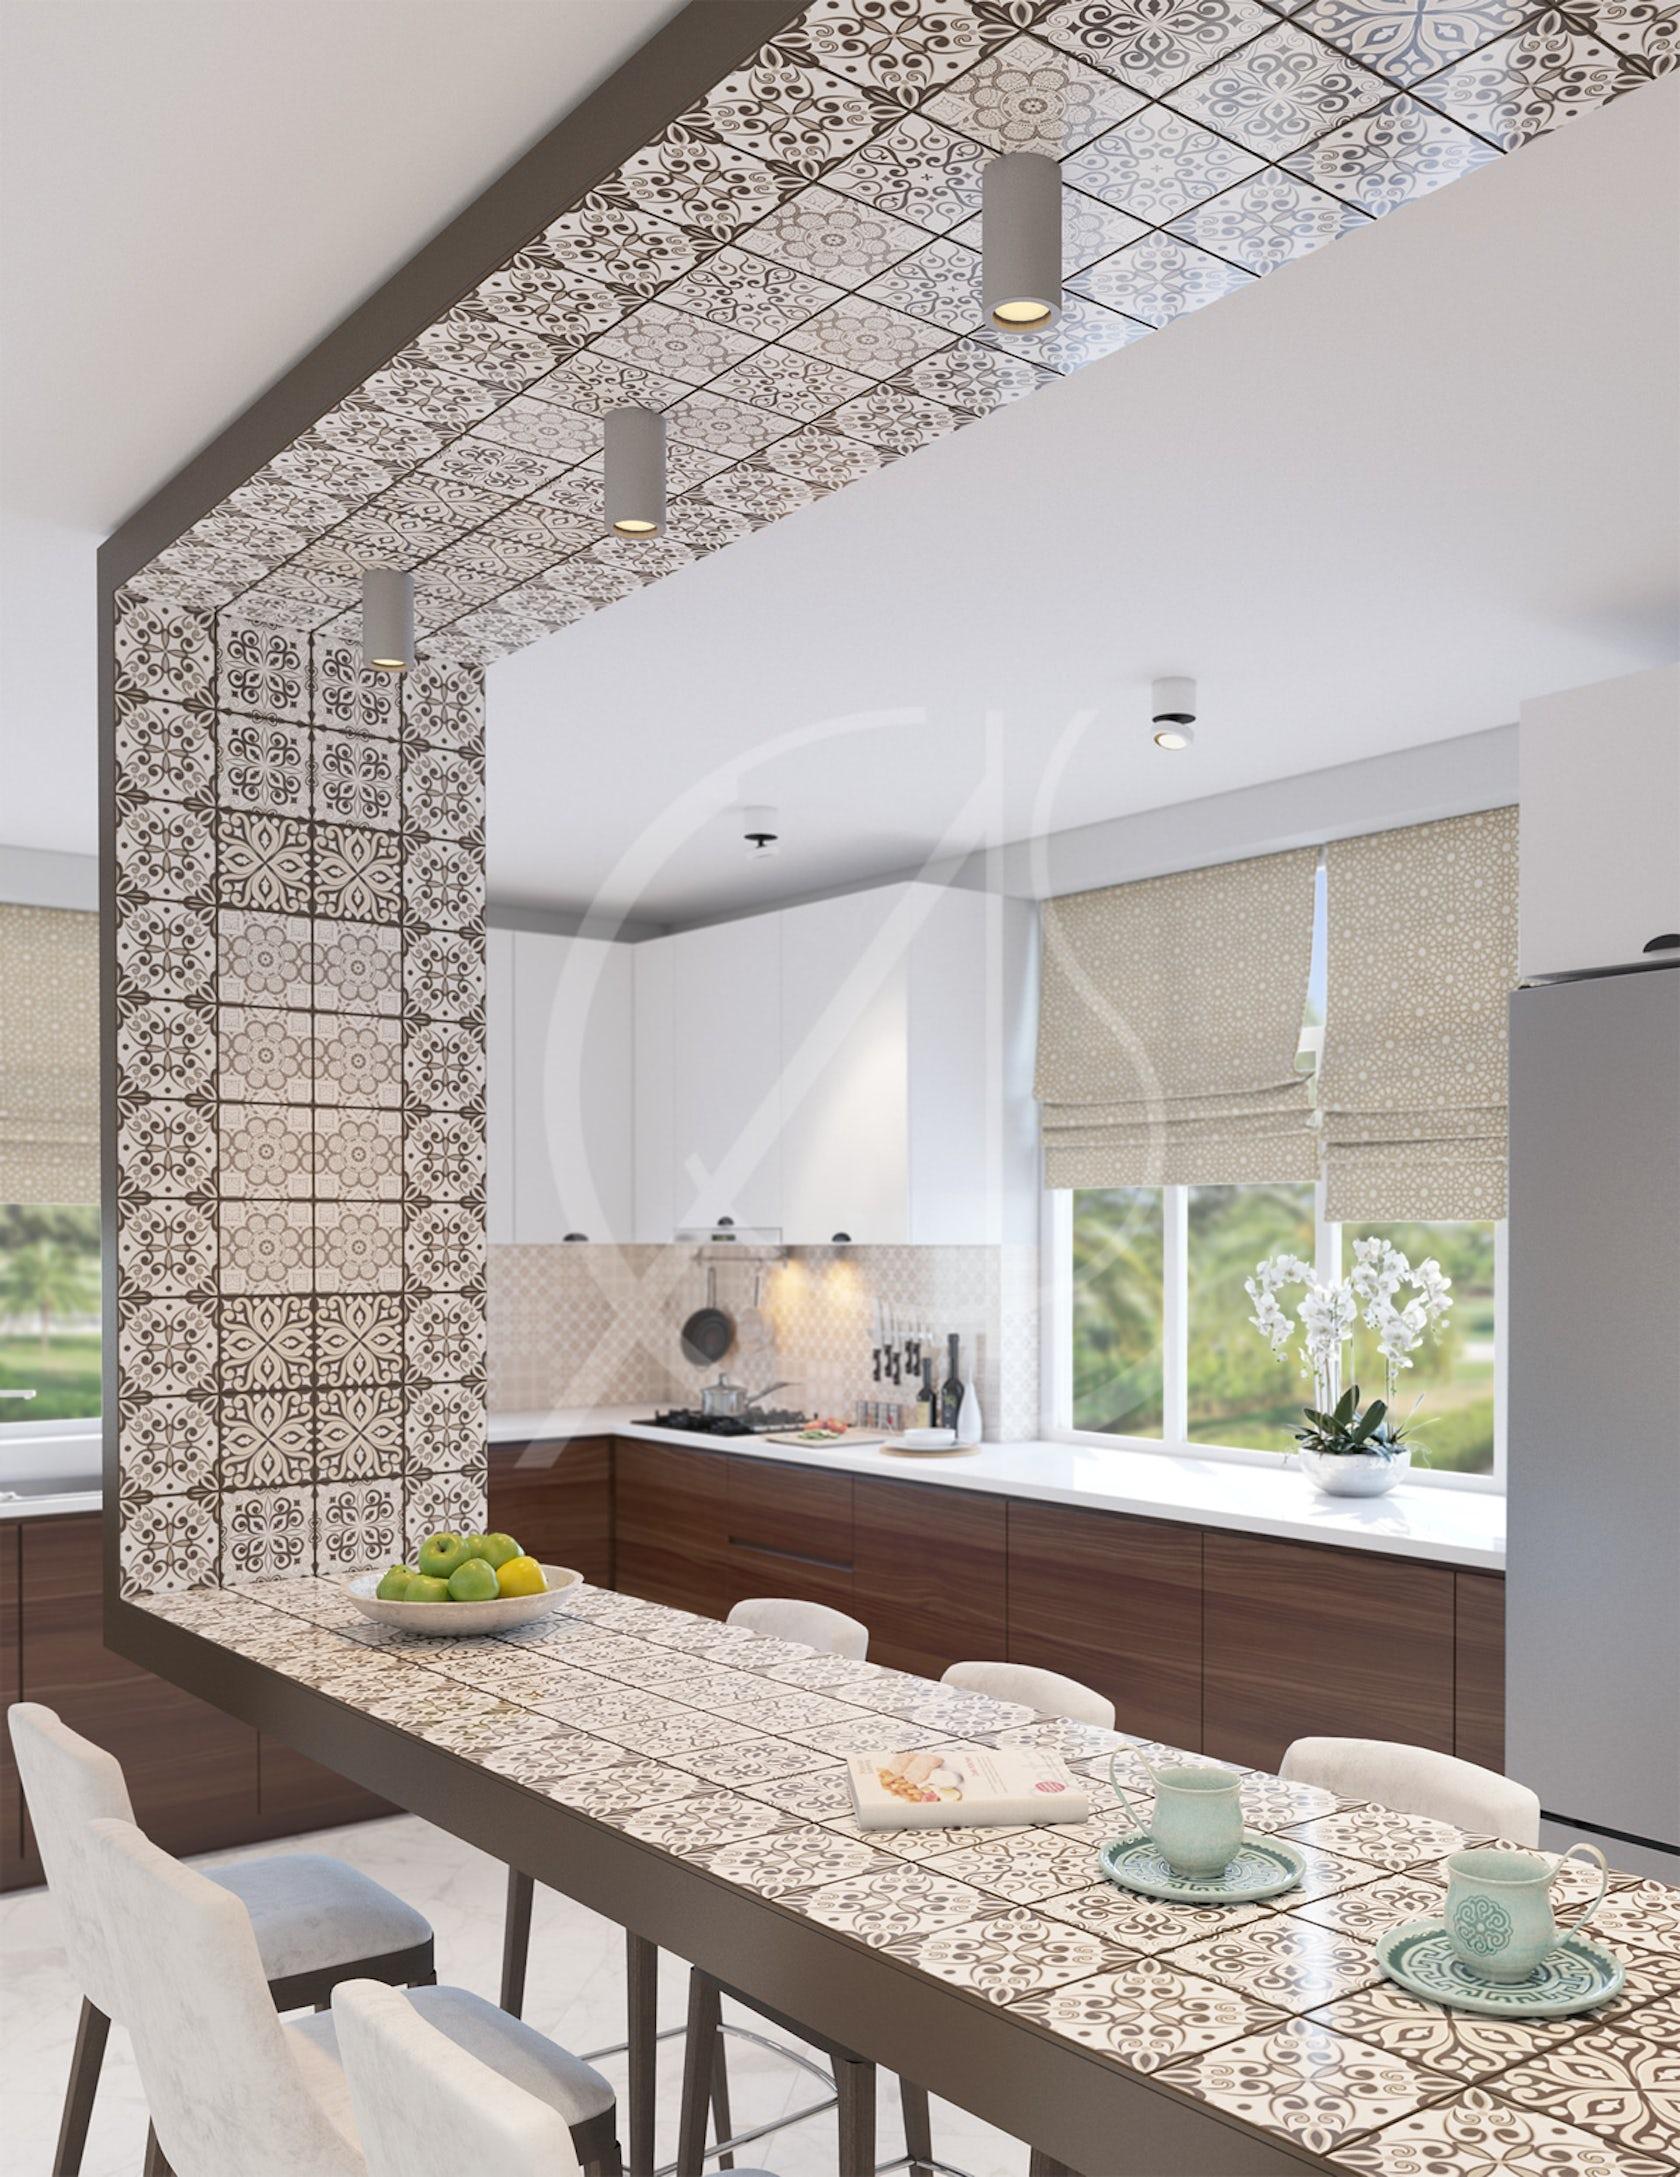 Modern Islamic Home Interior Design on Architizer